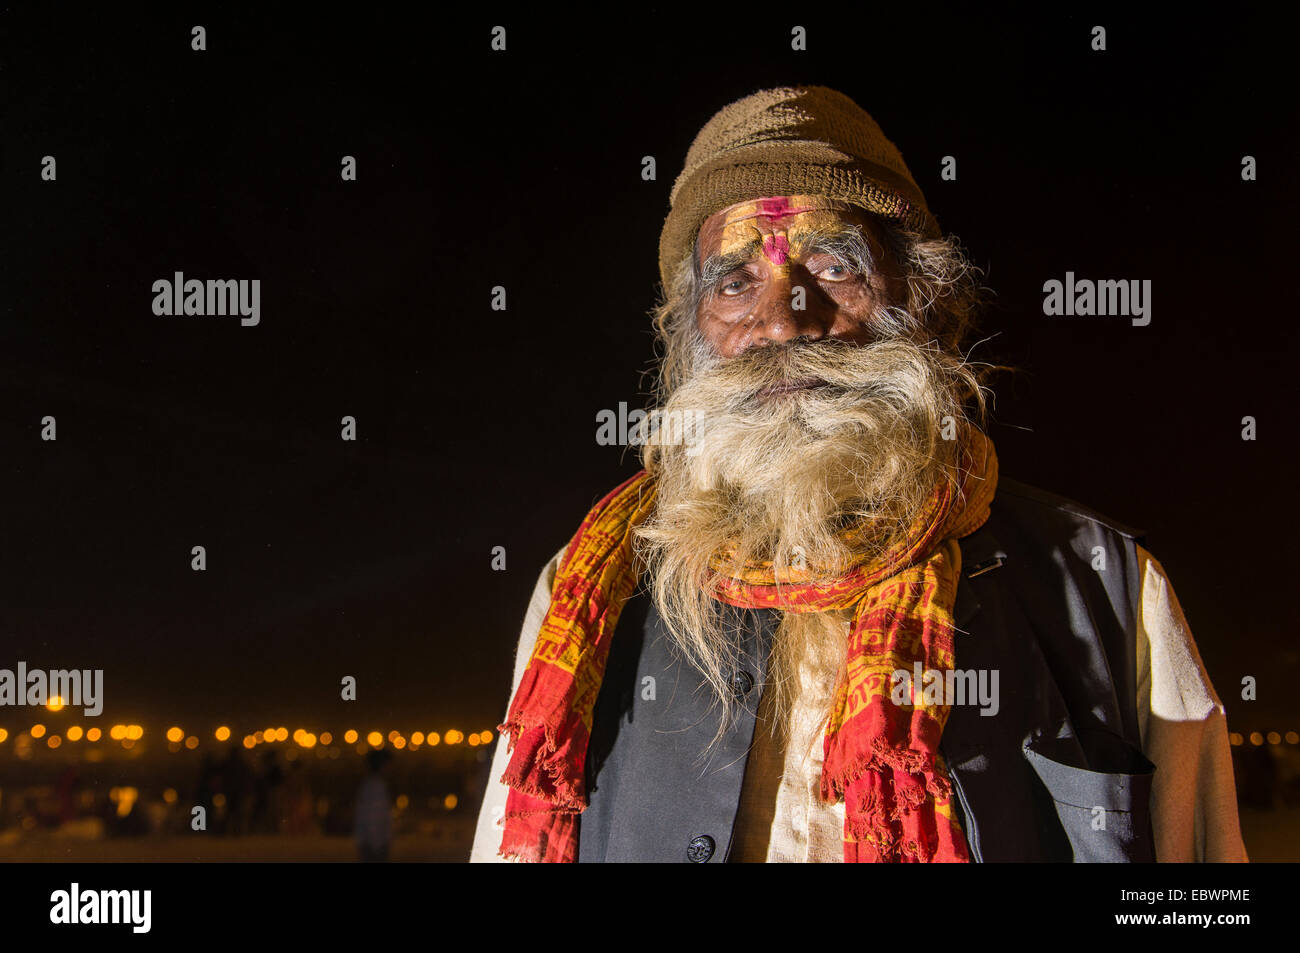 Rama sadhu, holy man, at night at the Sangam, the confluence of the rivers Ganges, Yamuna and Saraswati - Stock Image